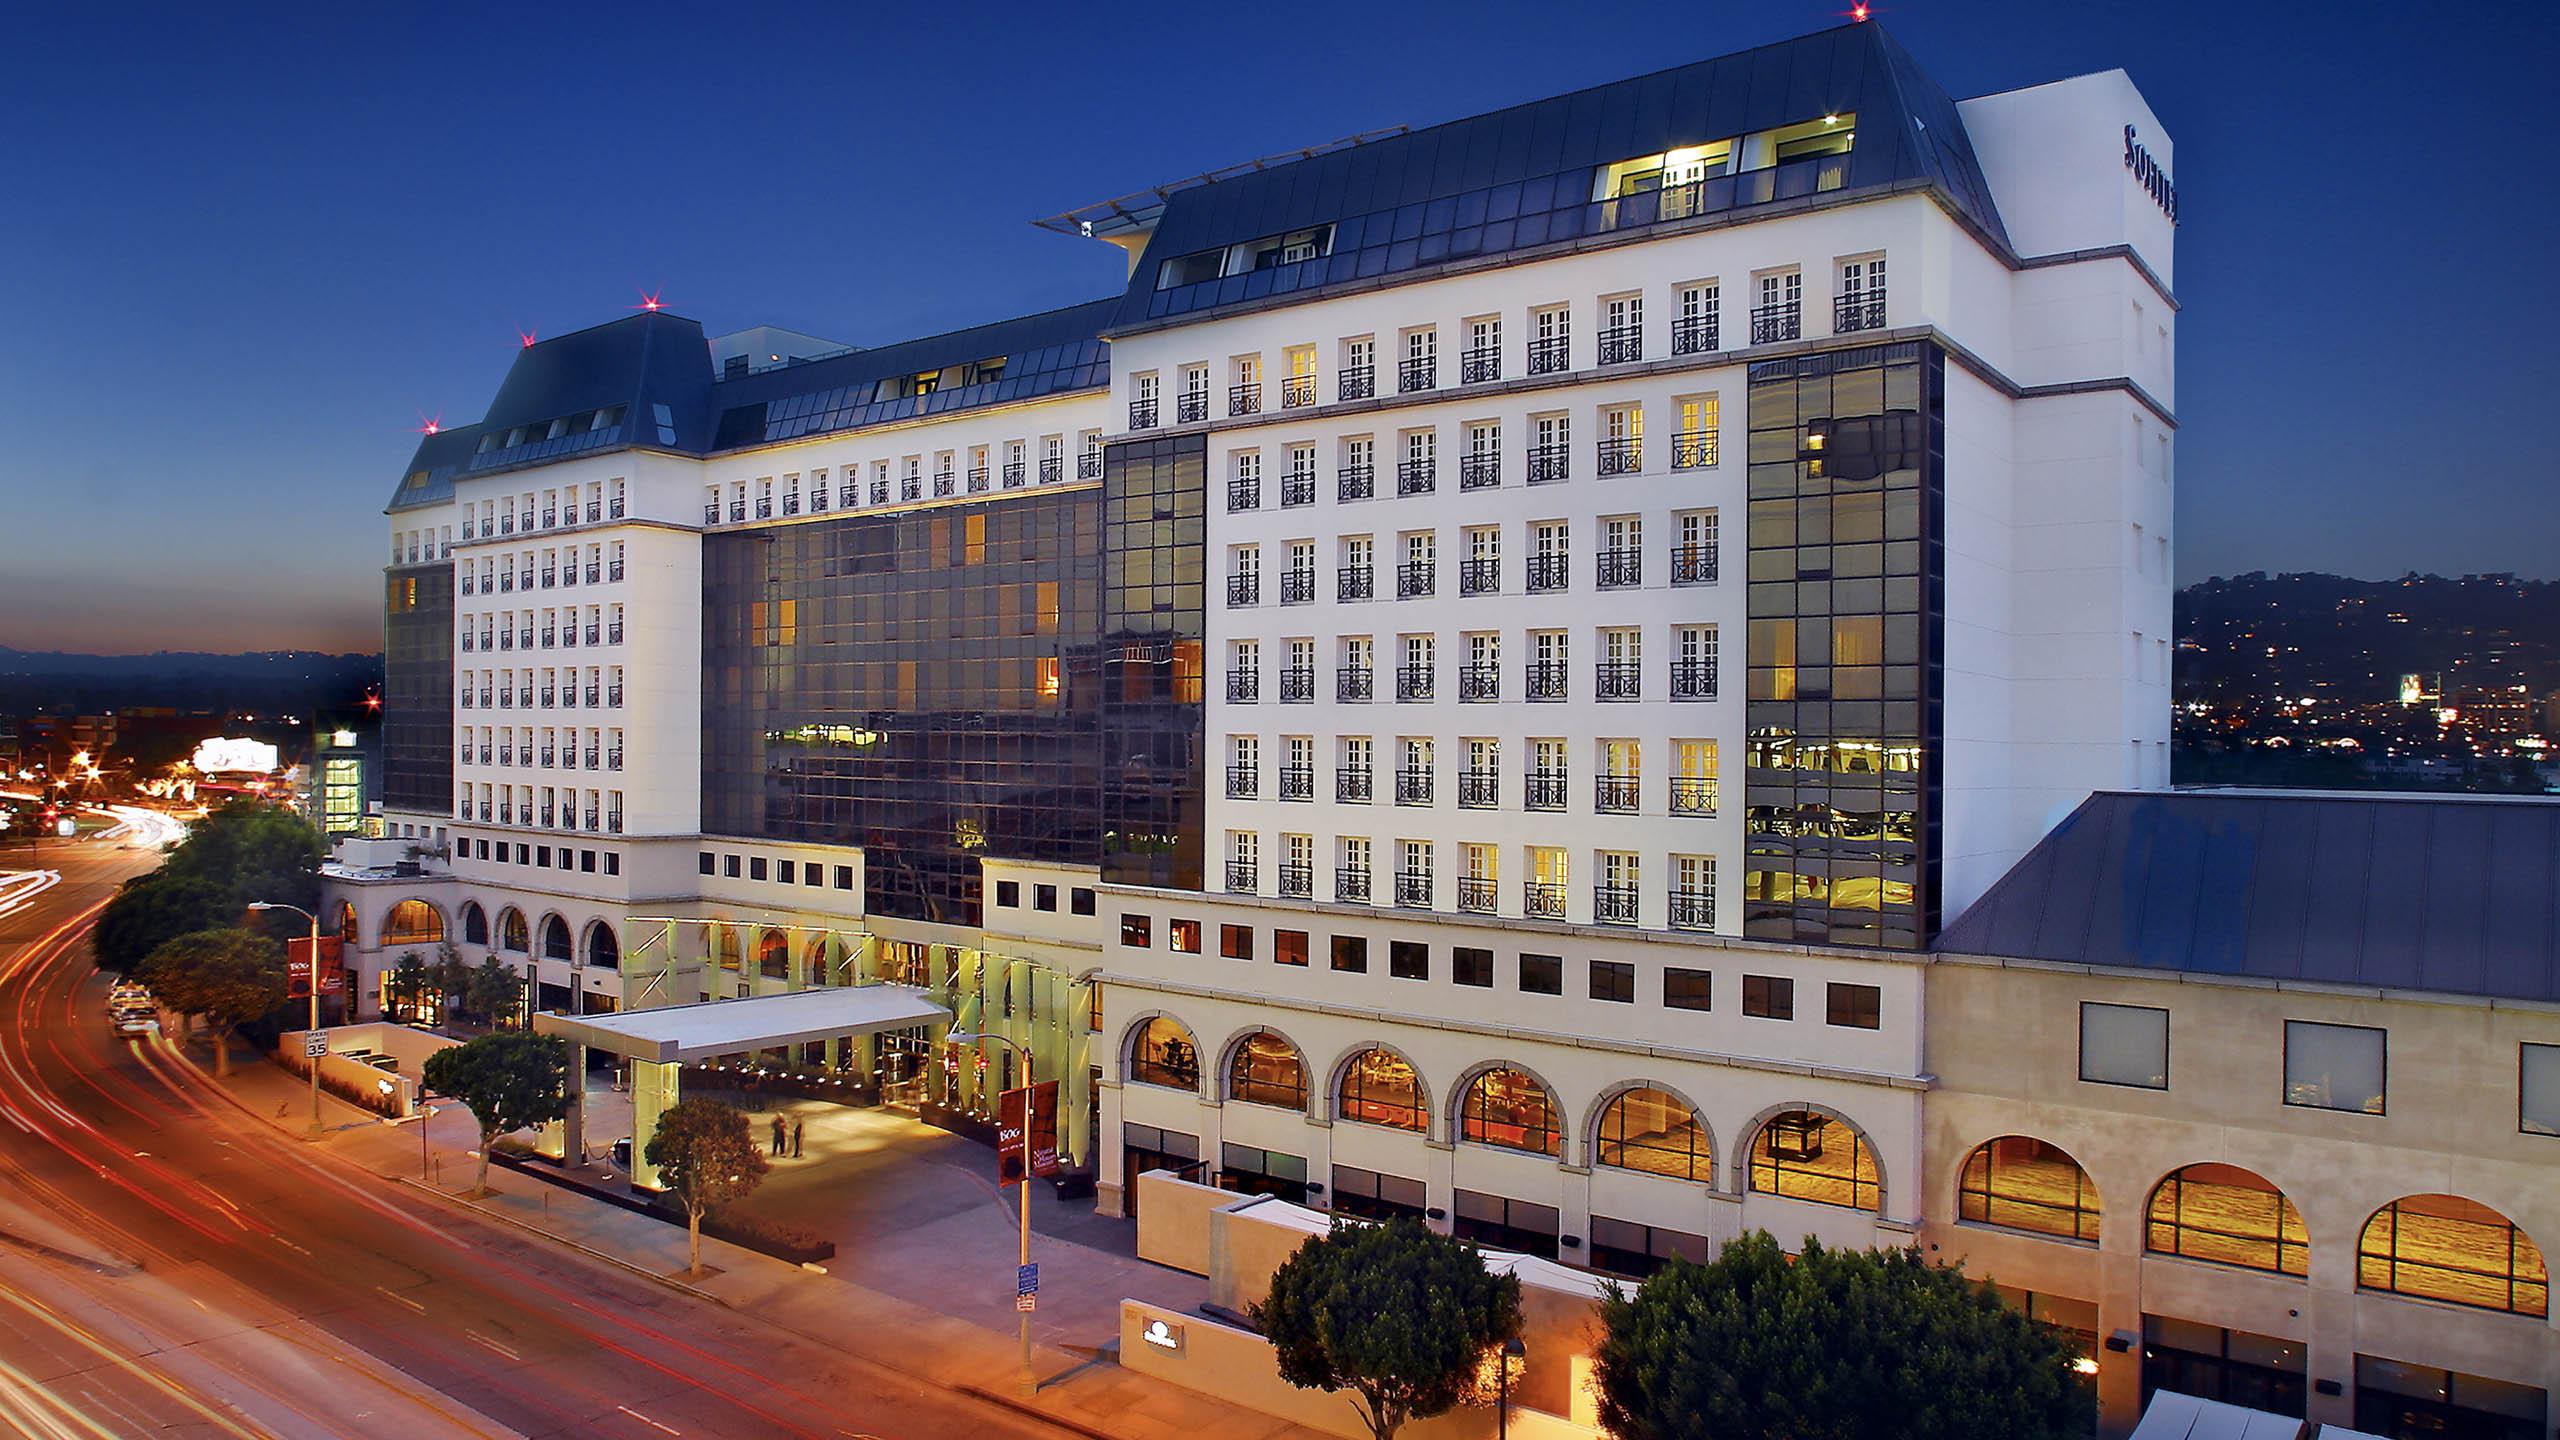 Sofitel hotel in Beverly Hills, LA